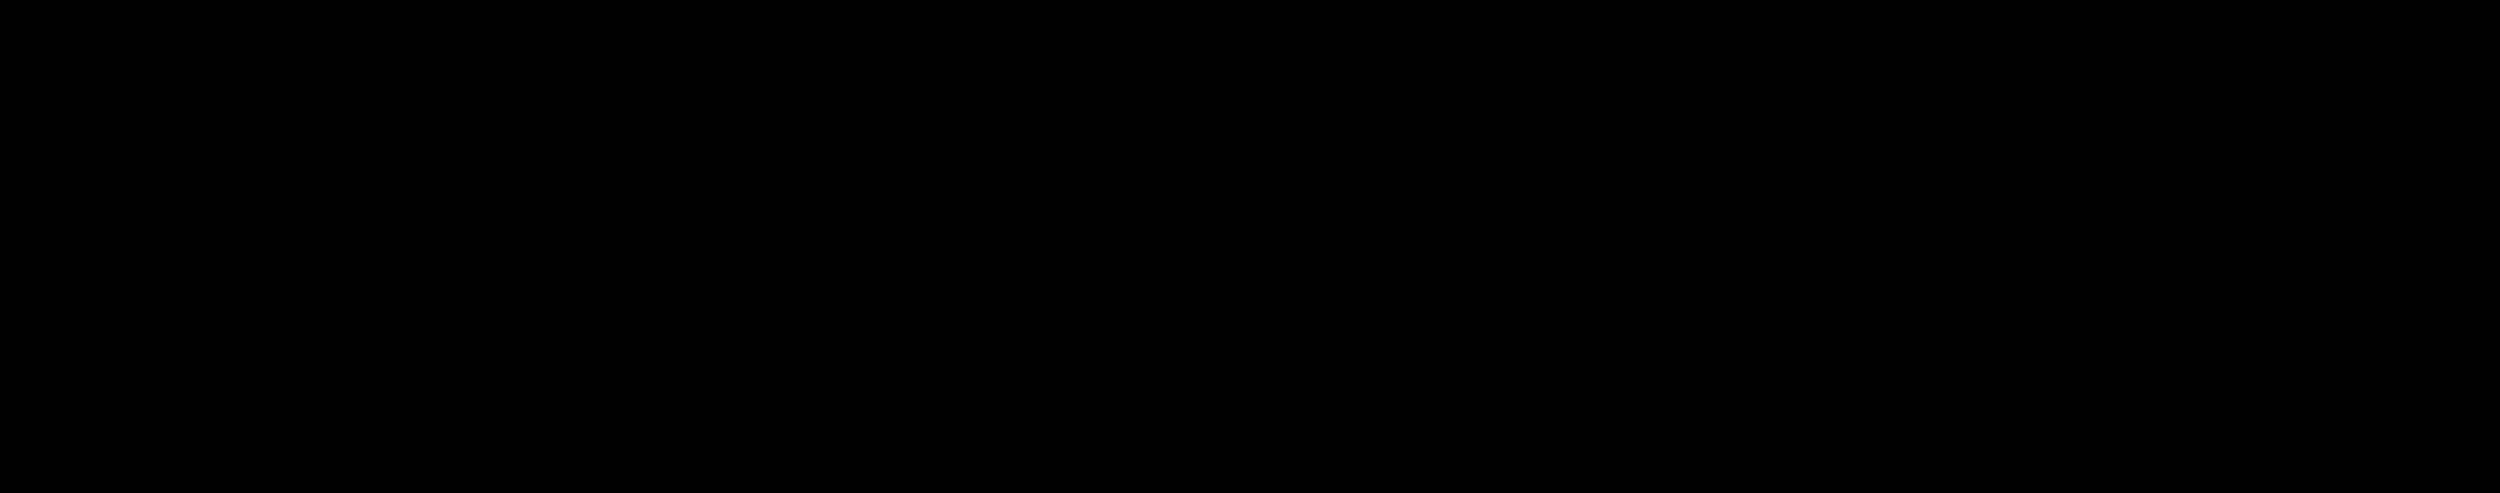 First & Main Logo.png